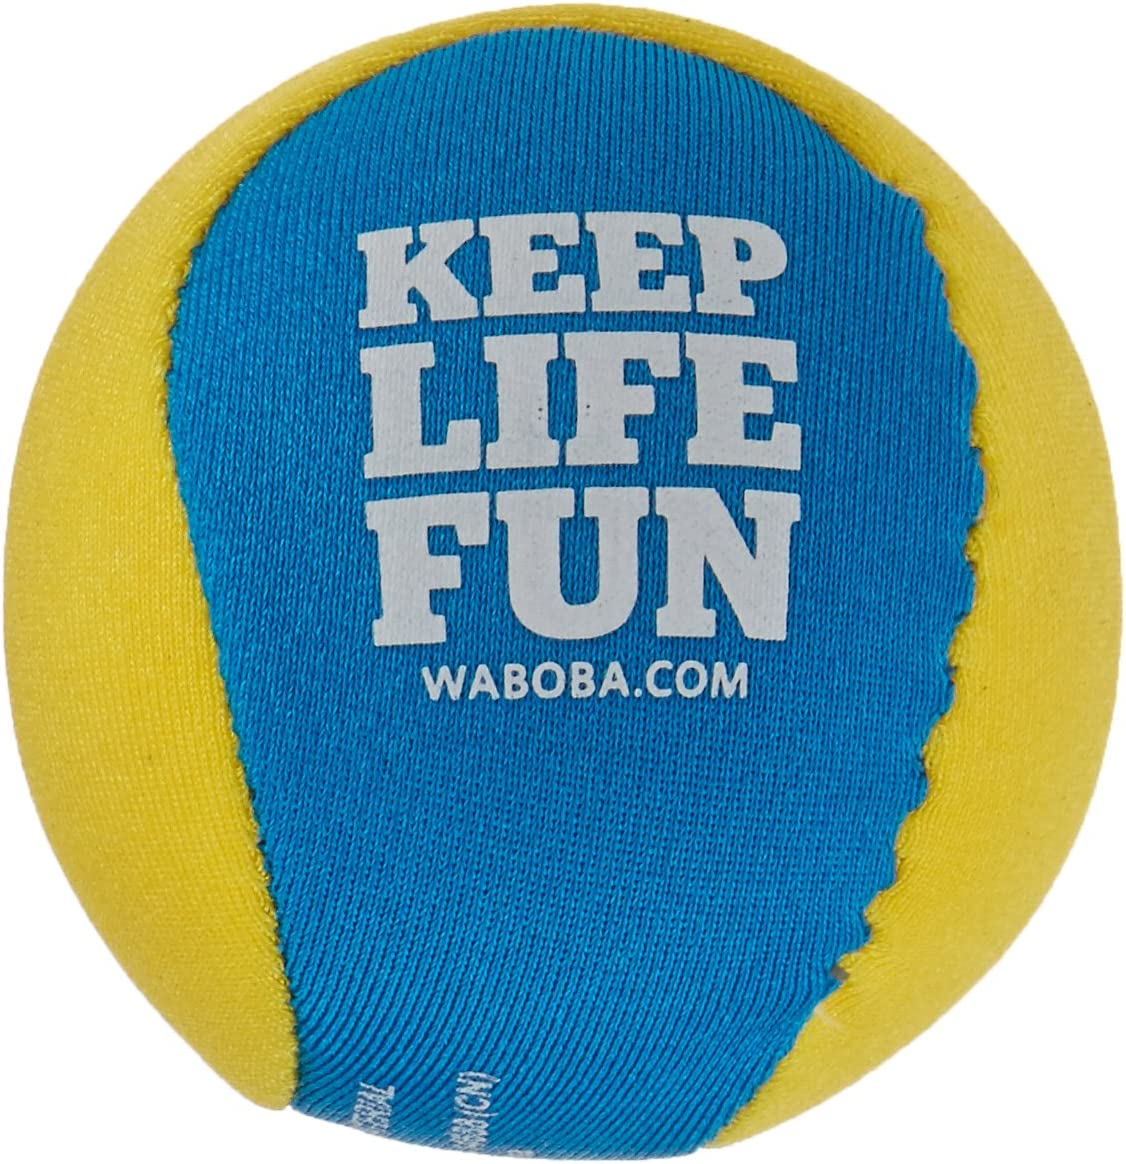 Waboba - Surf pelota surf, 55 mm, colores aleatorios , Modelos ...